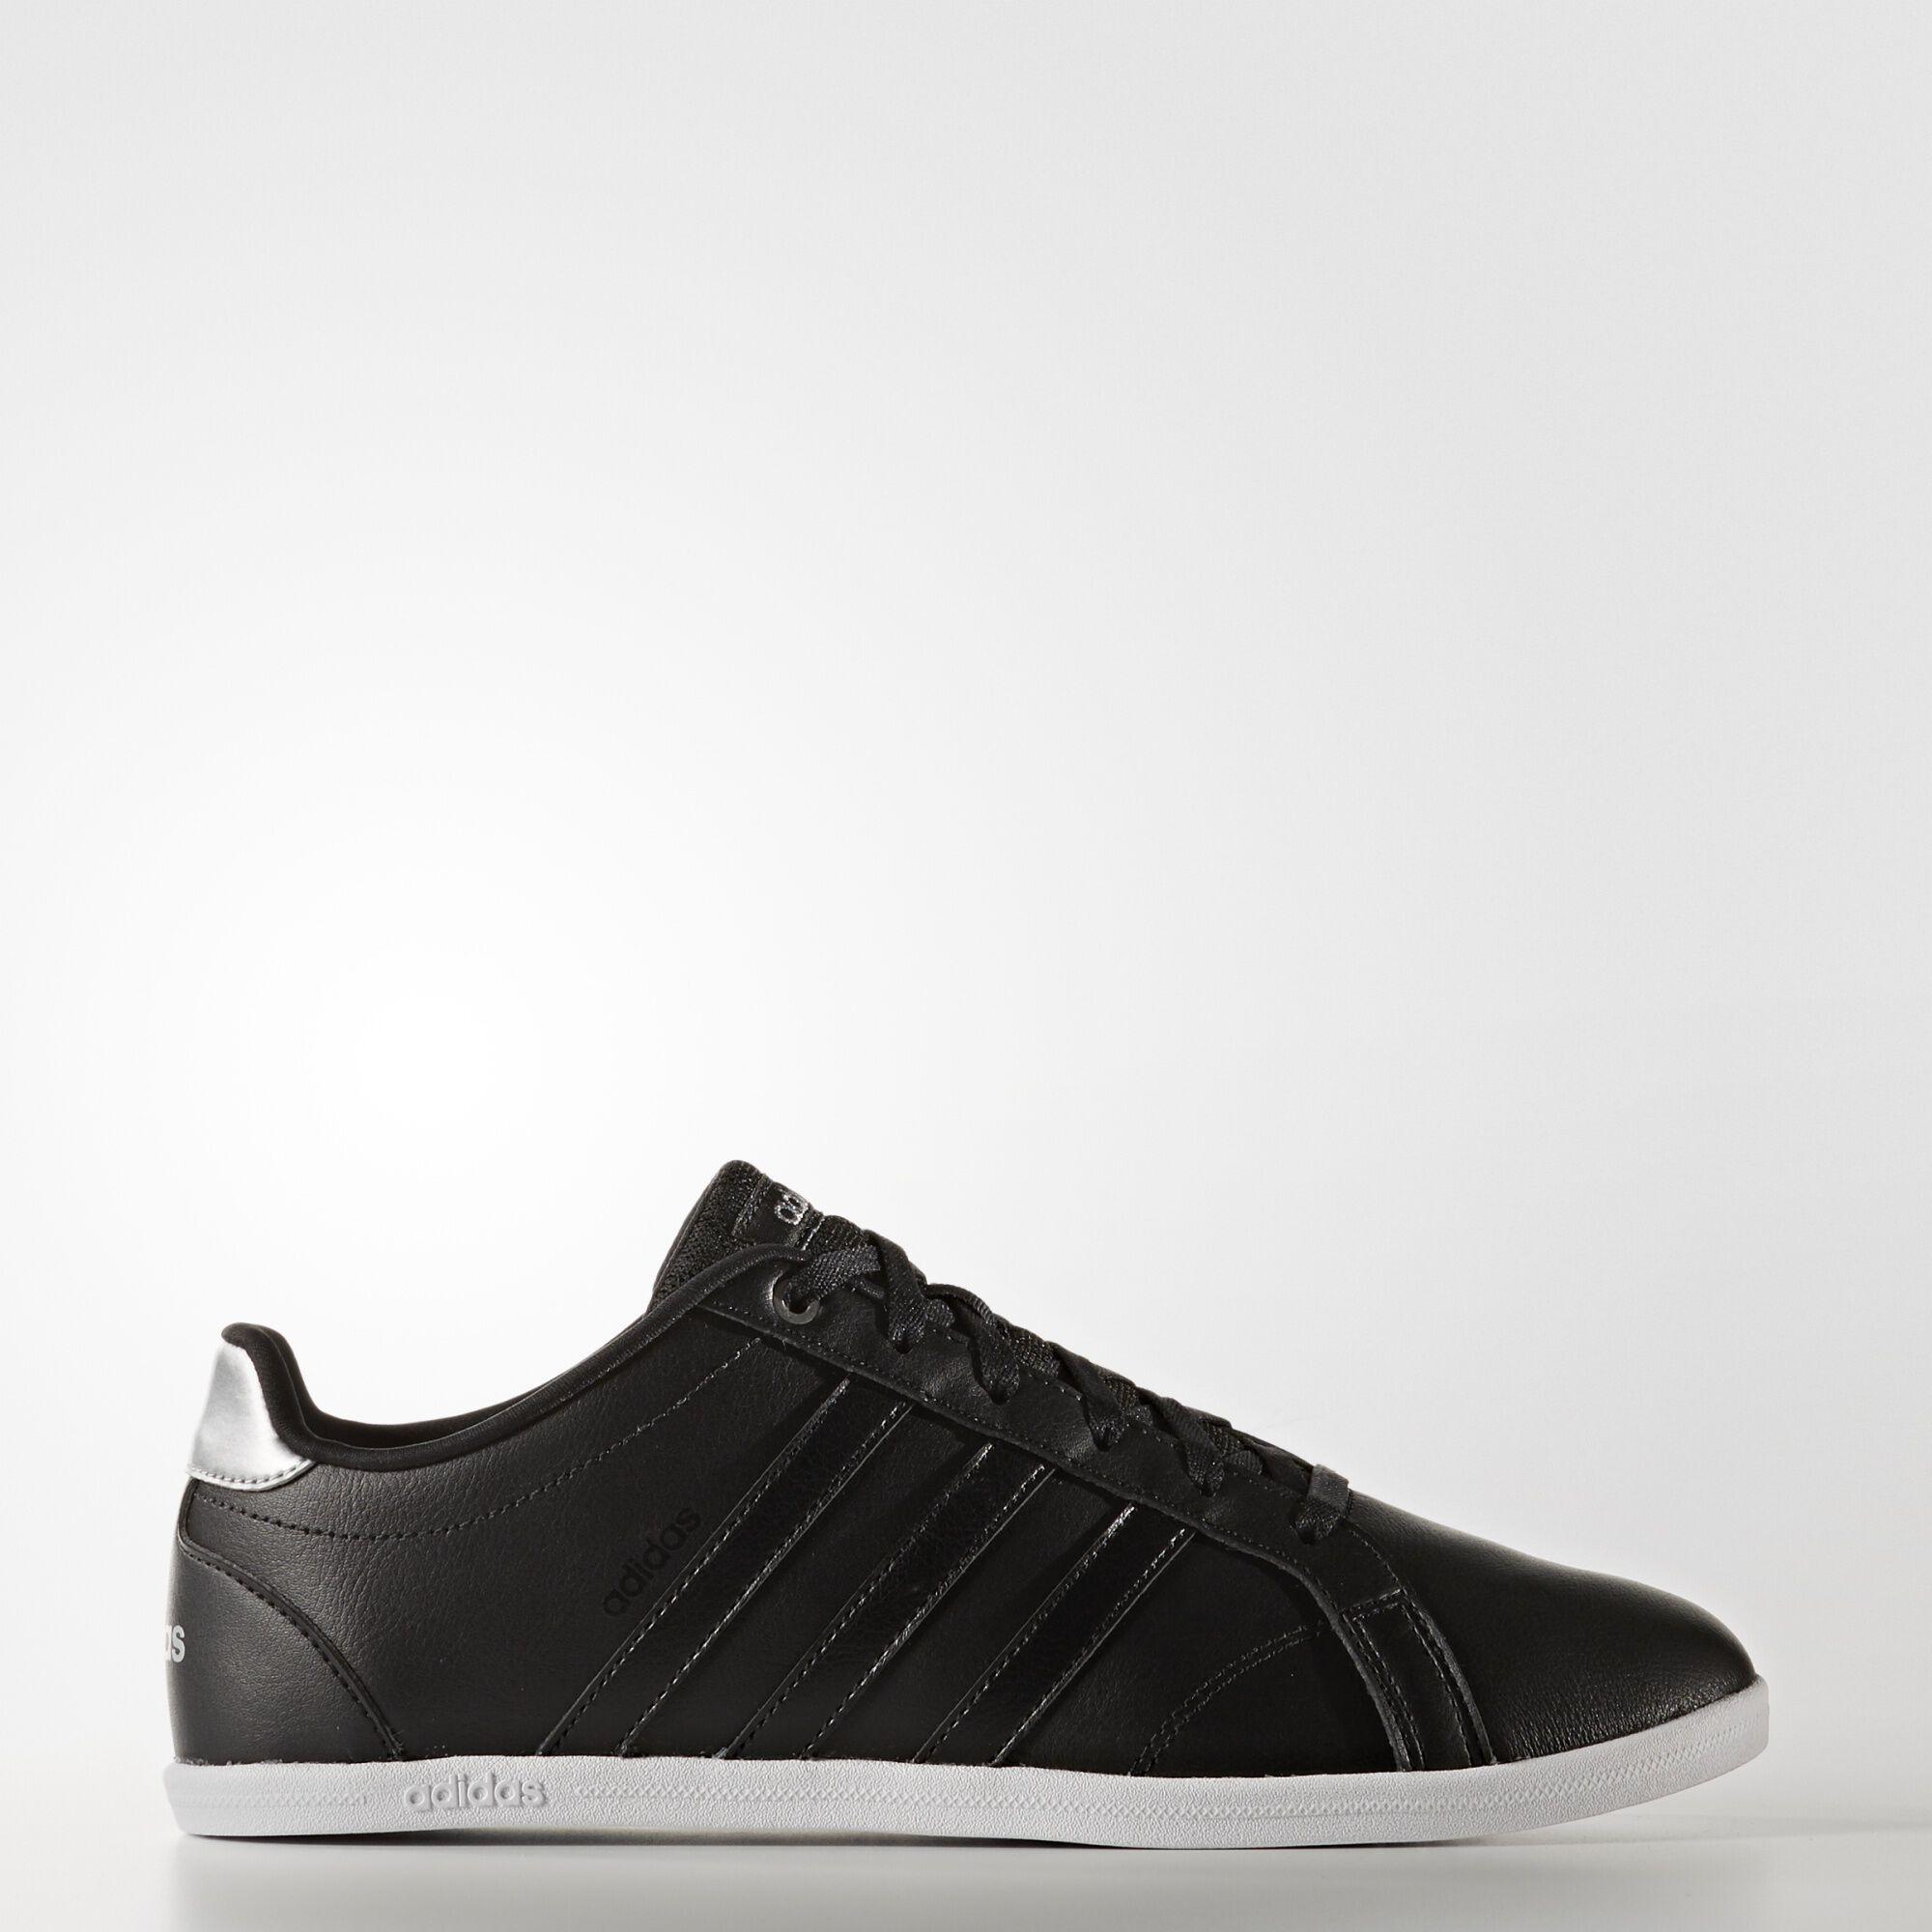 Adidas Neo Slim Navy